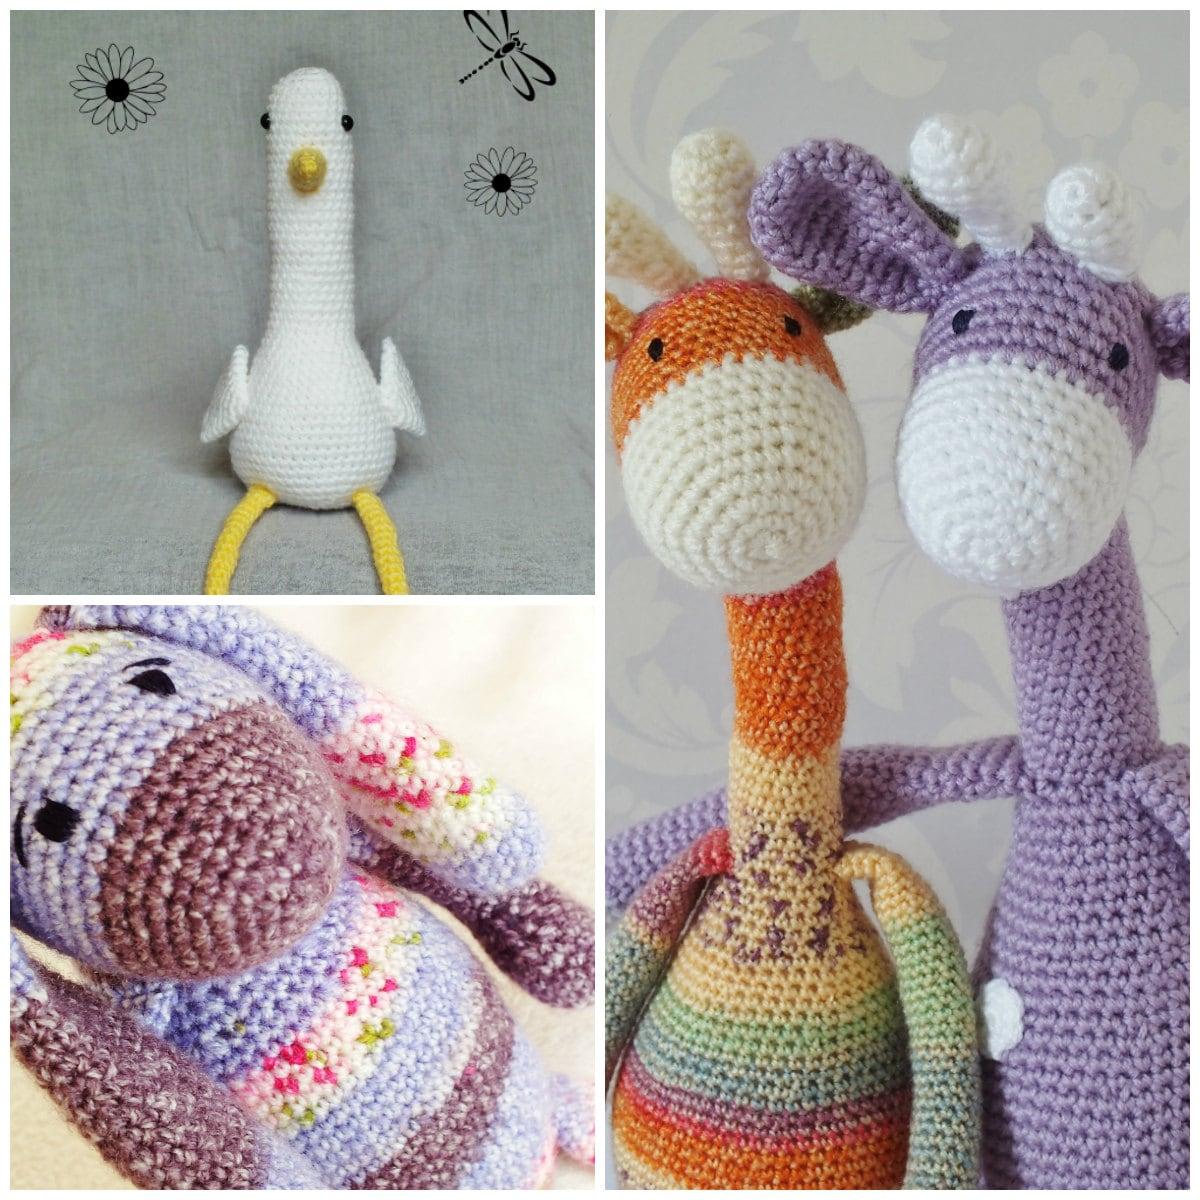 Amigurumi Yarn Pack : Crochet Amigurumi Toy PATTERN Pack Special Offer Giraffe Bunny